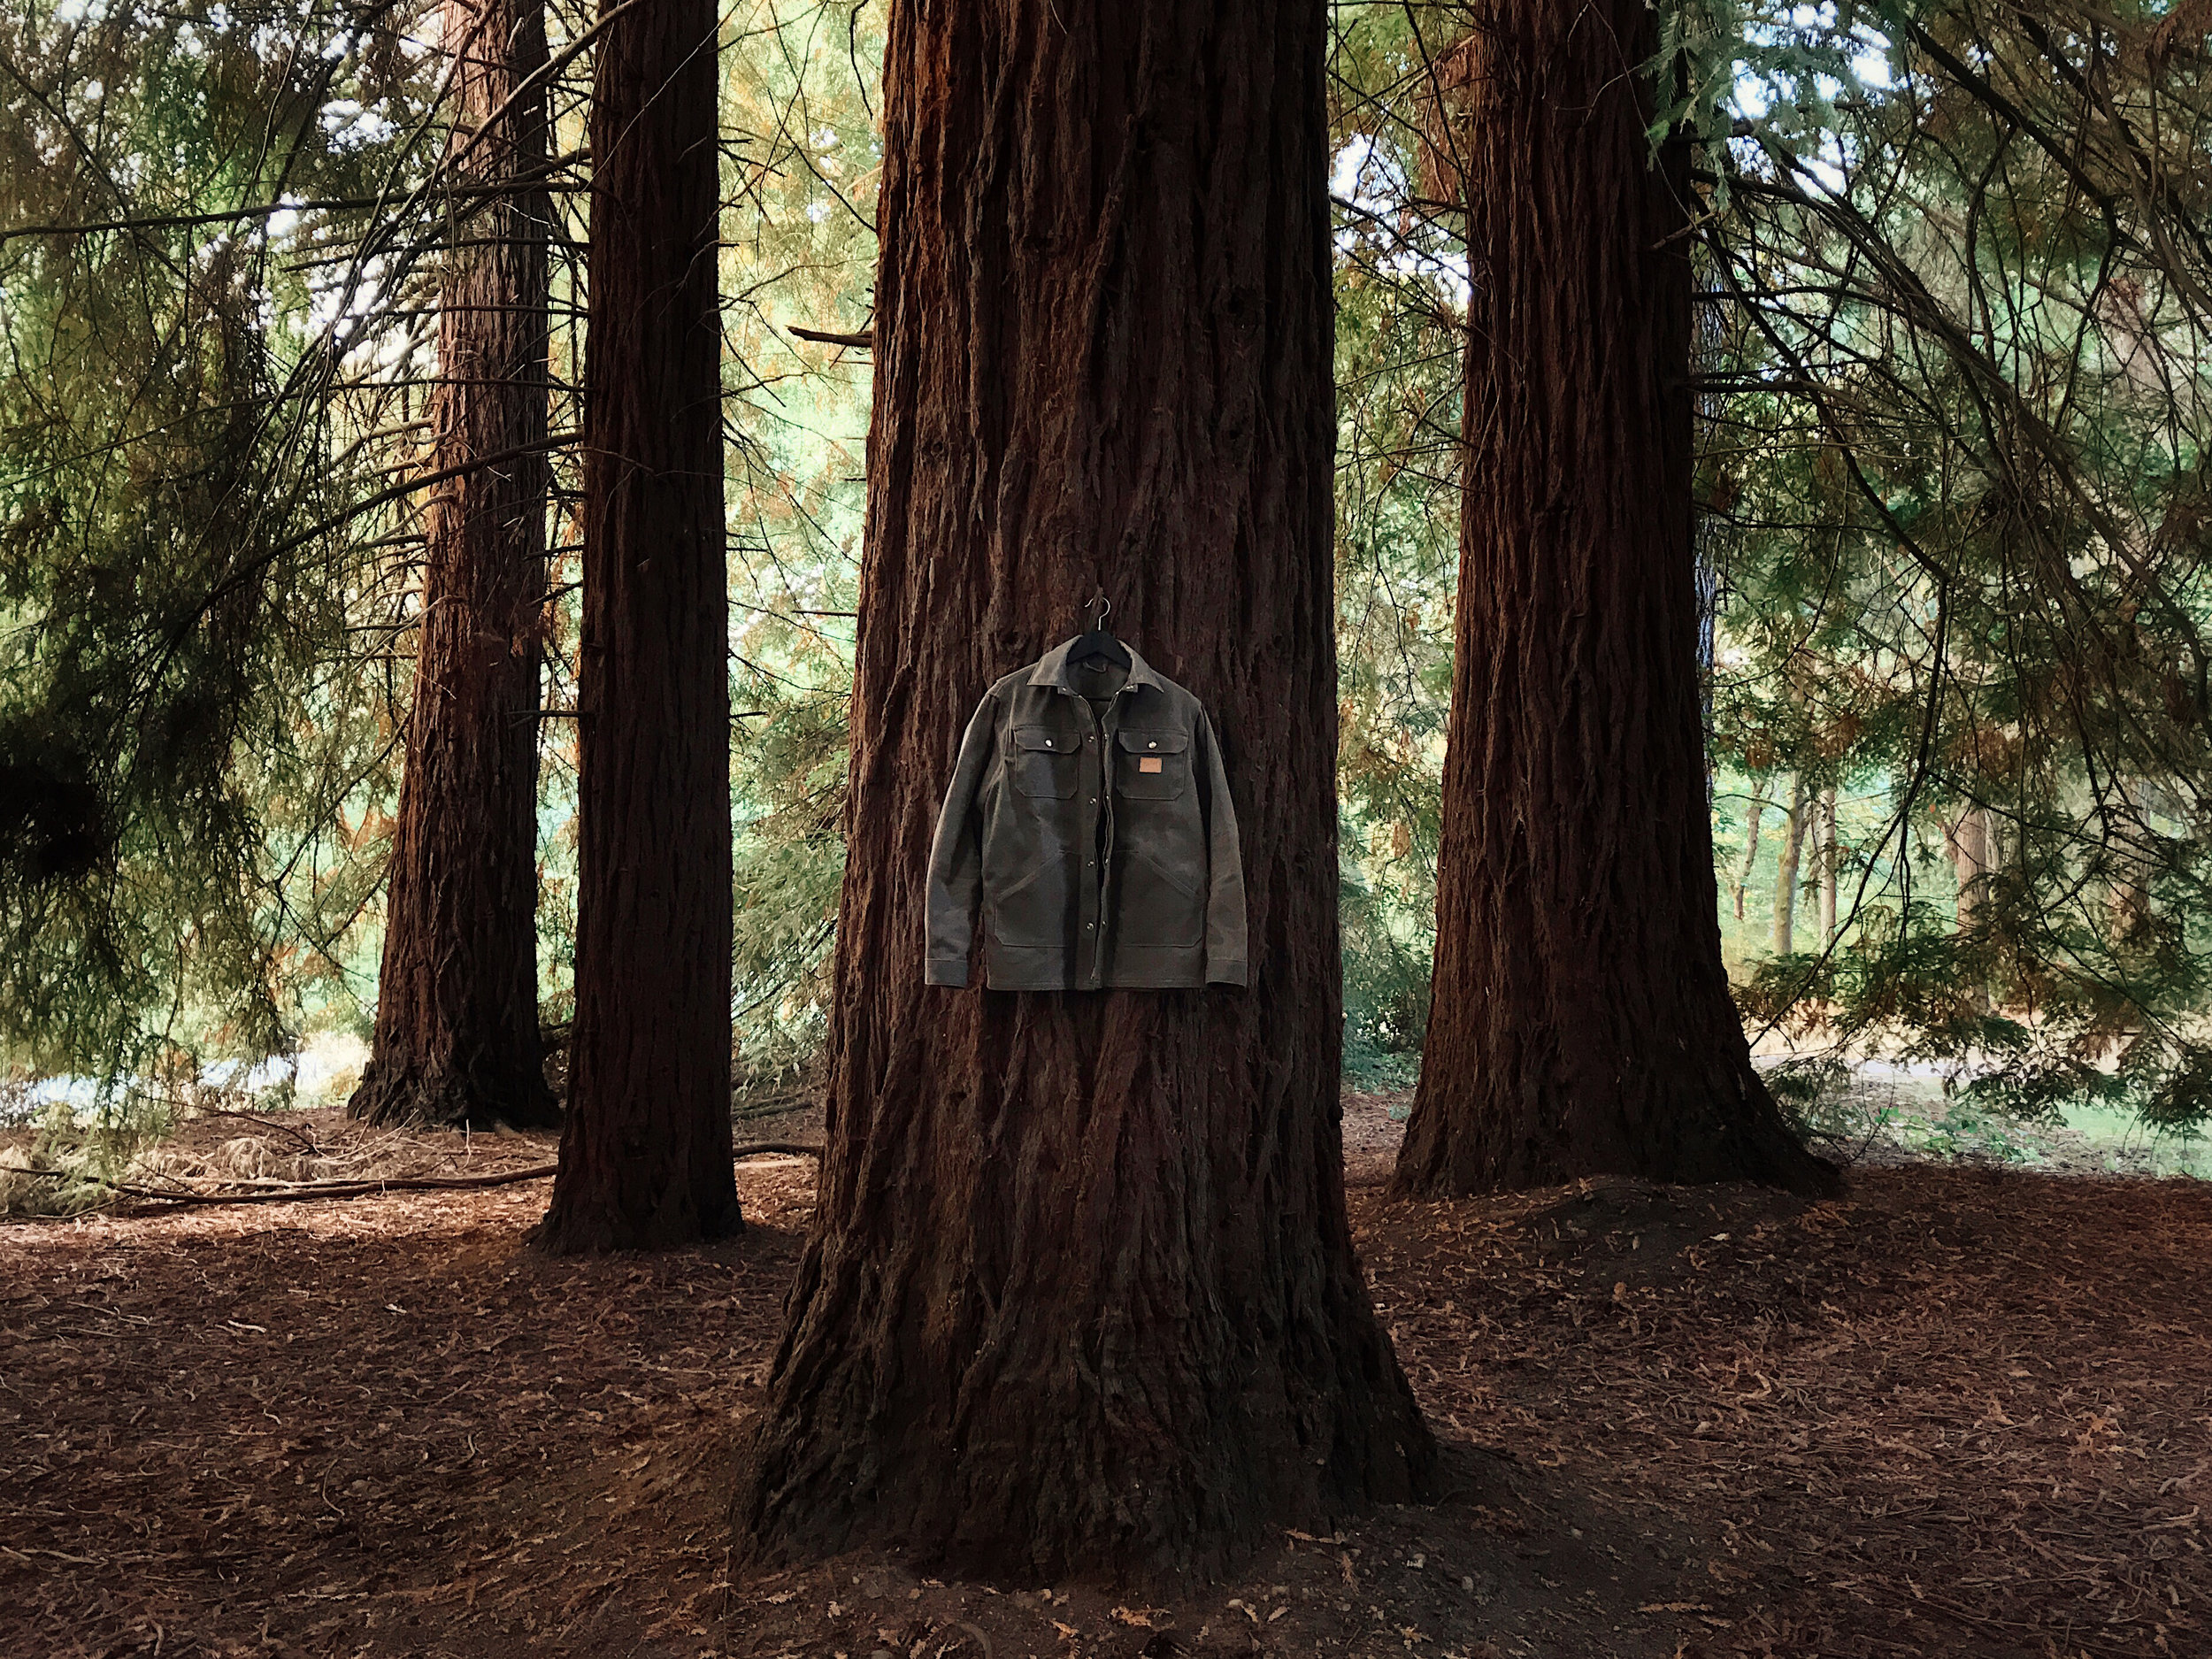 Wills Jacket Tree